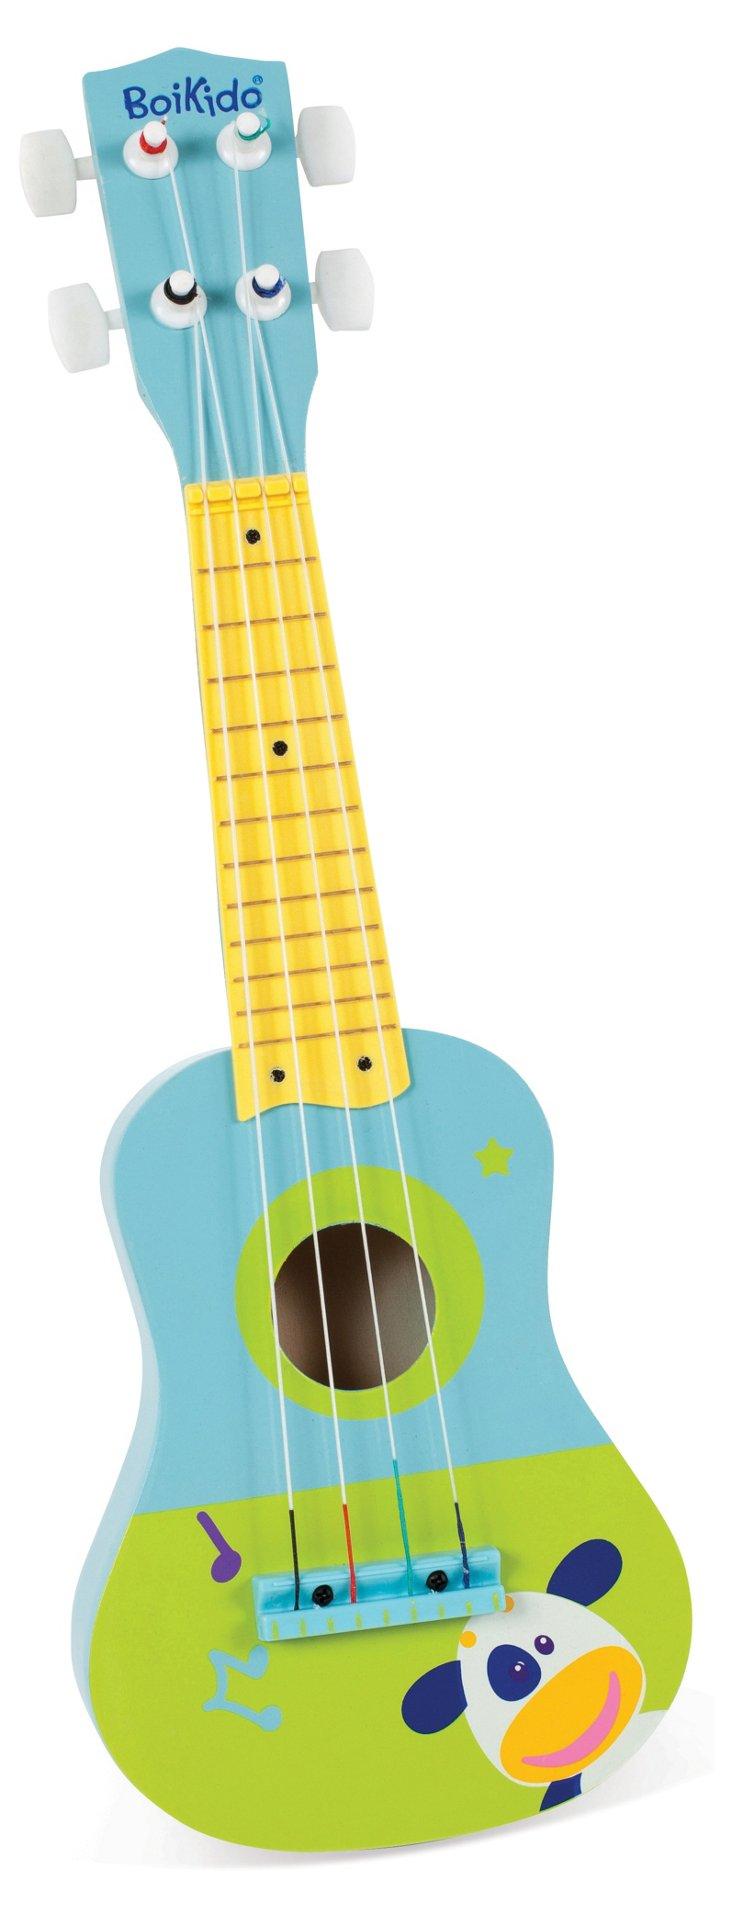 Wooden My First Guitar